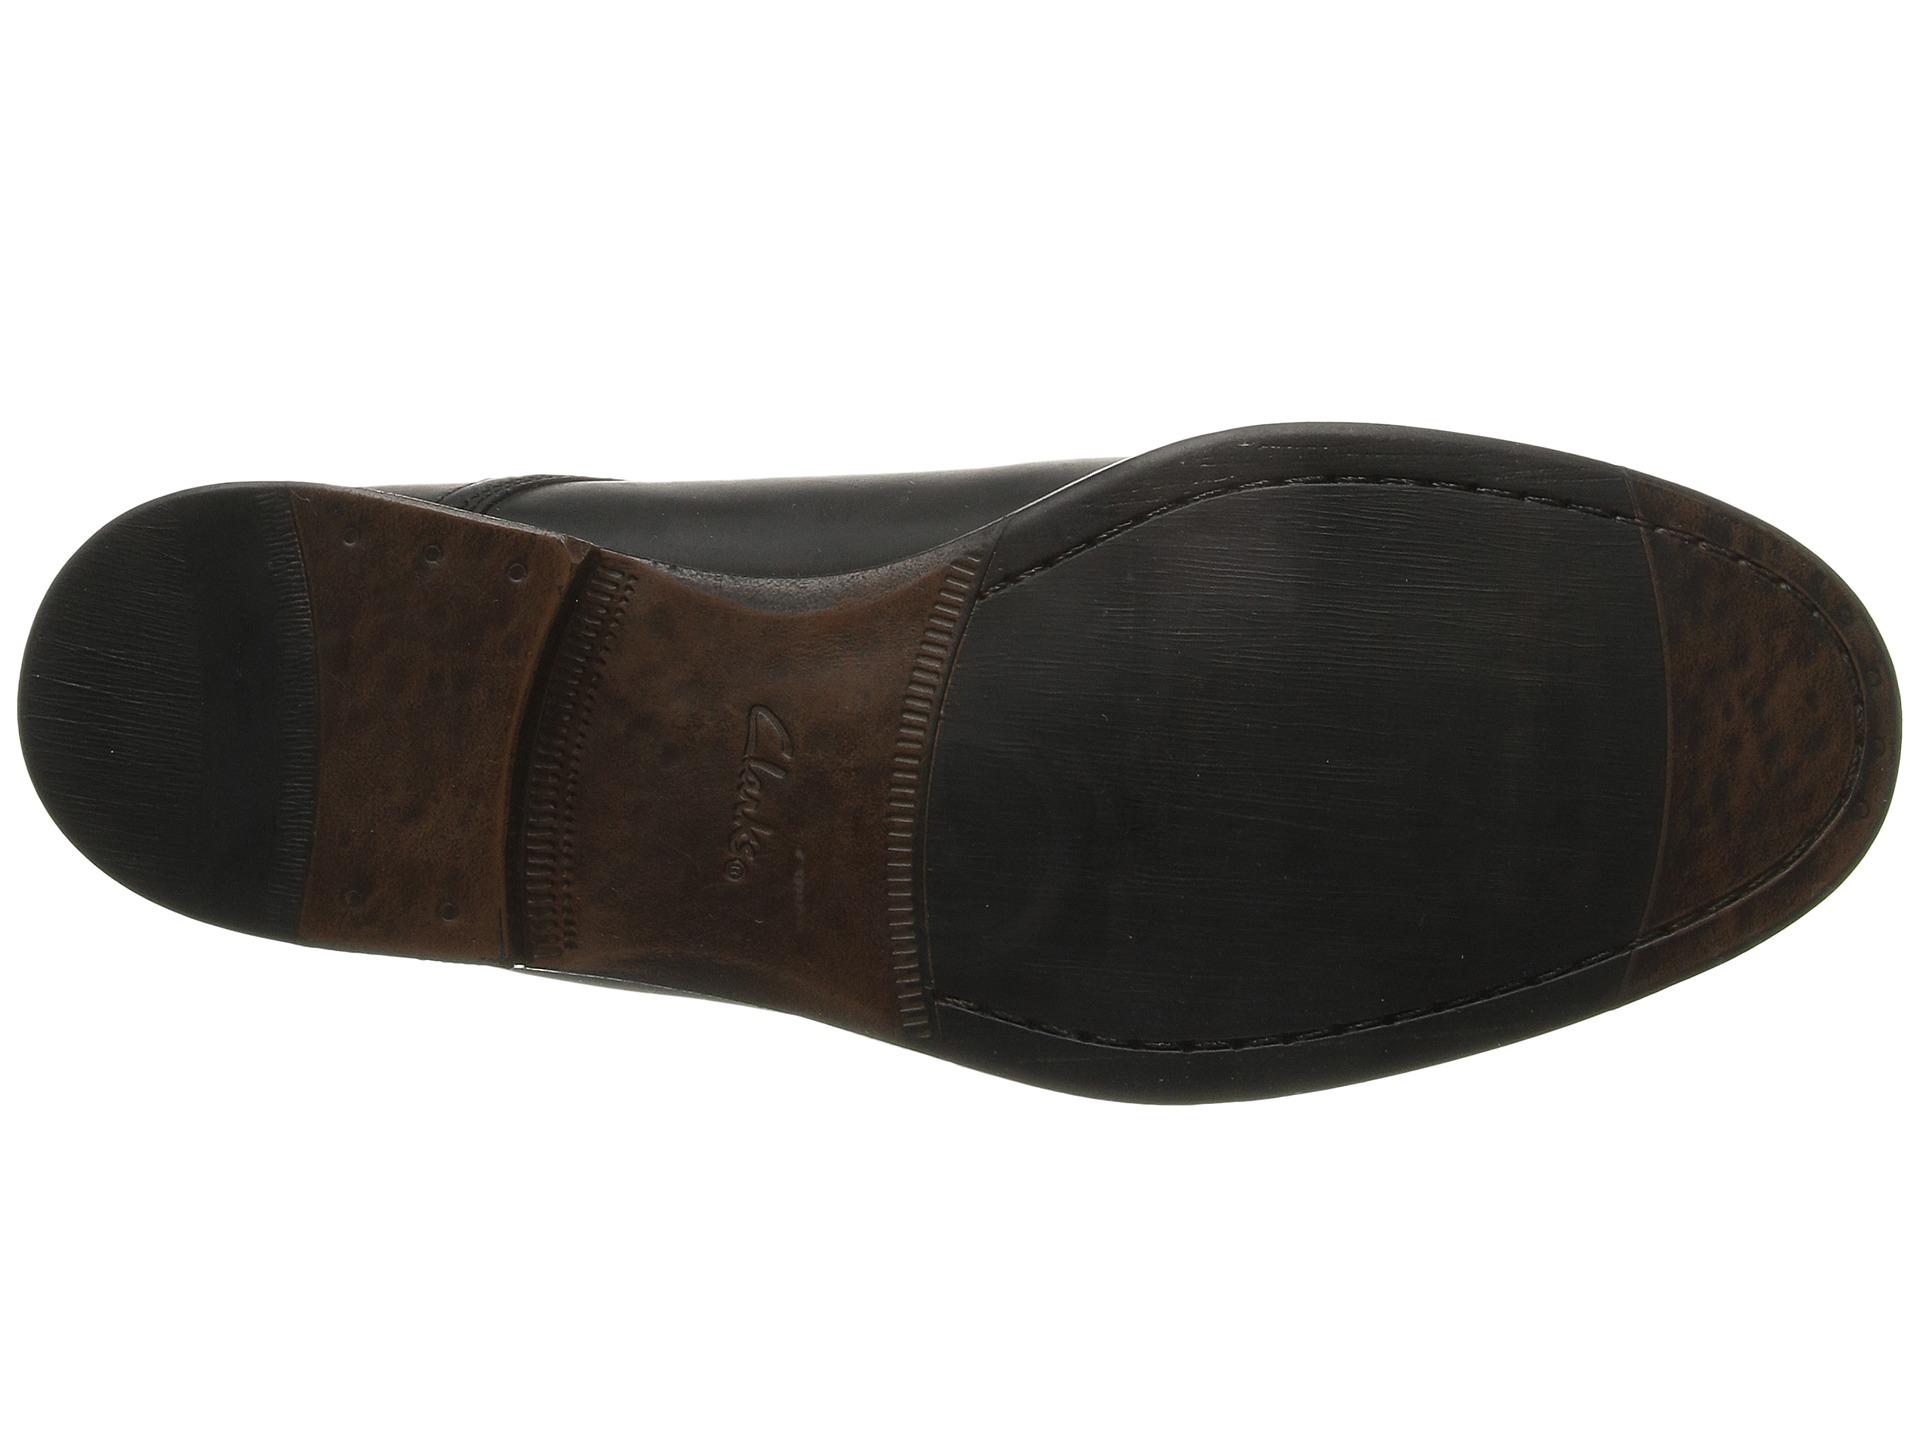 Clarks Chart Walk Black Dress Shoes